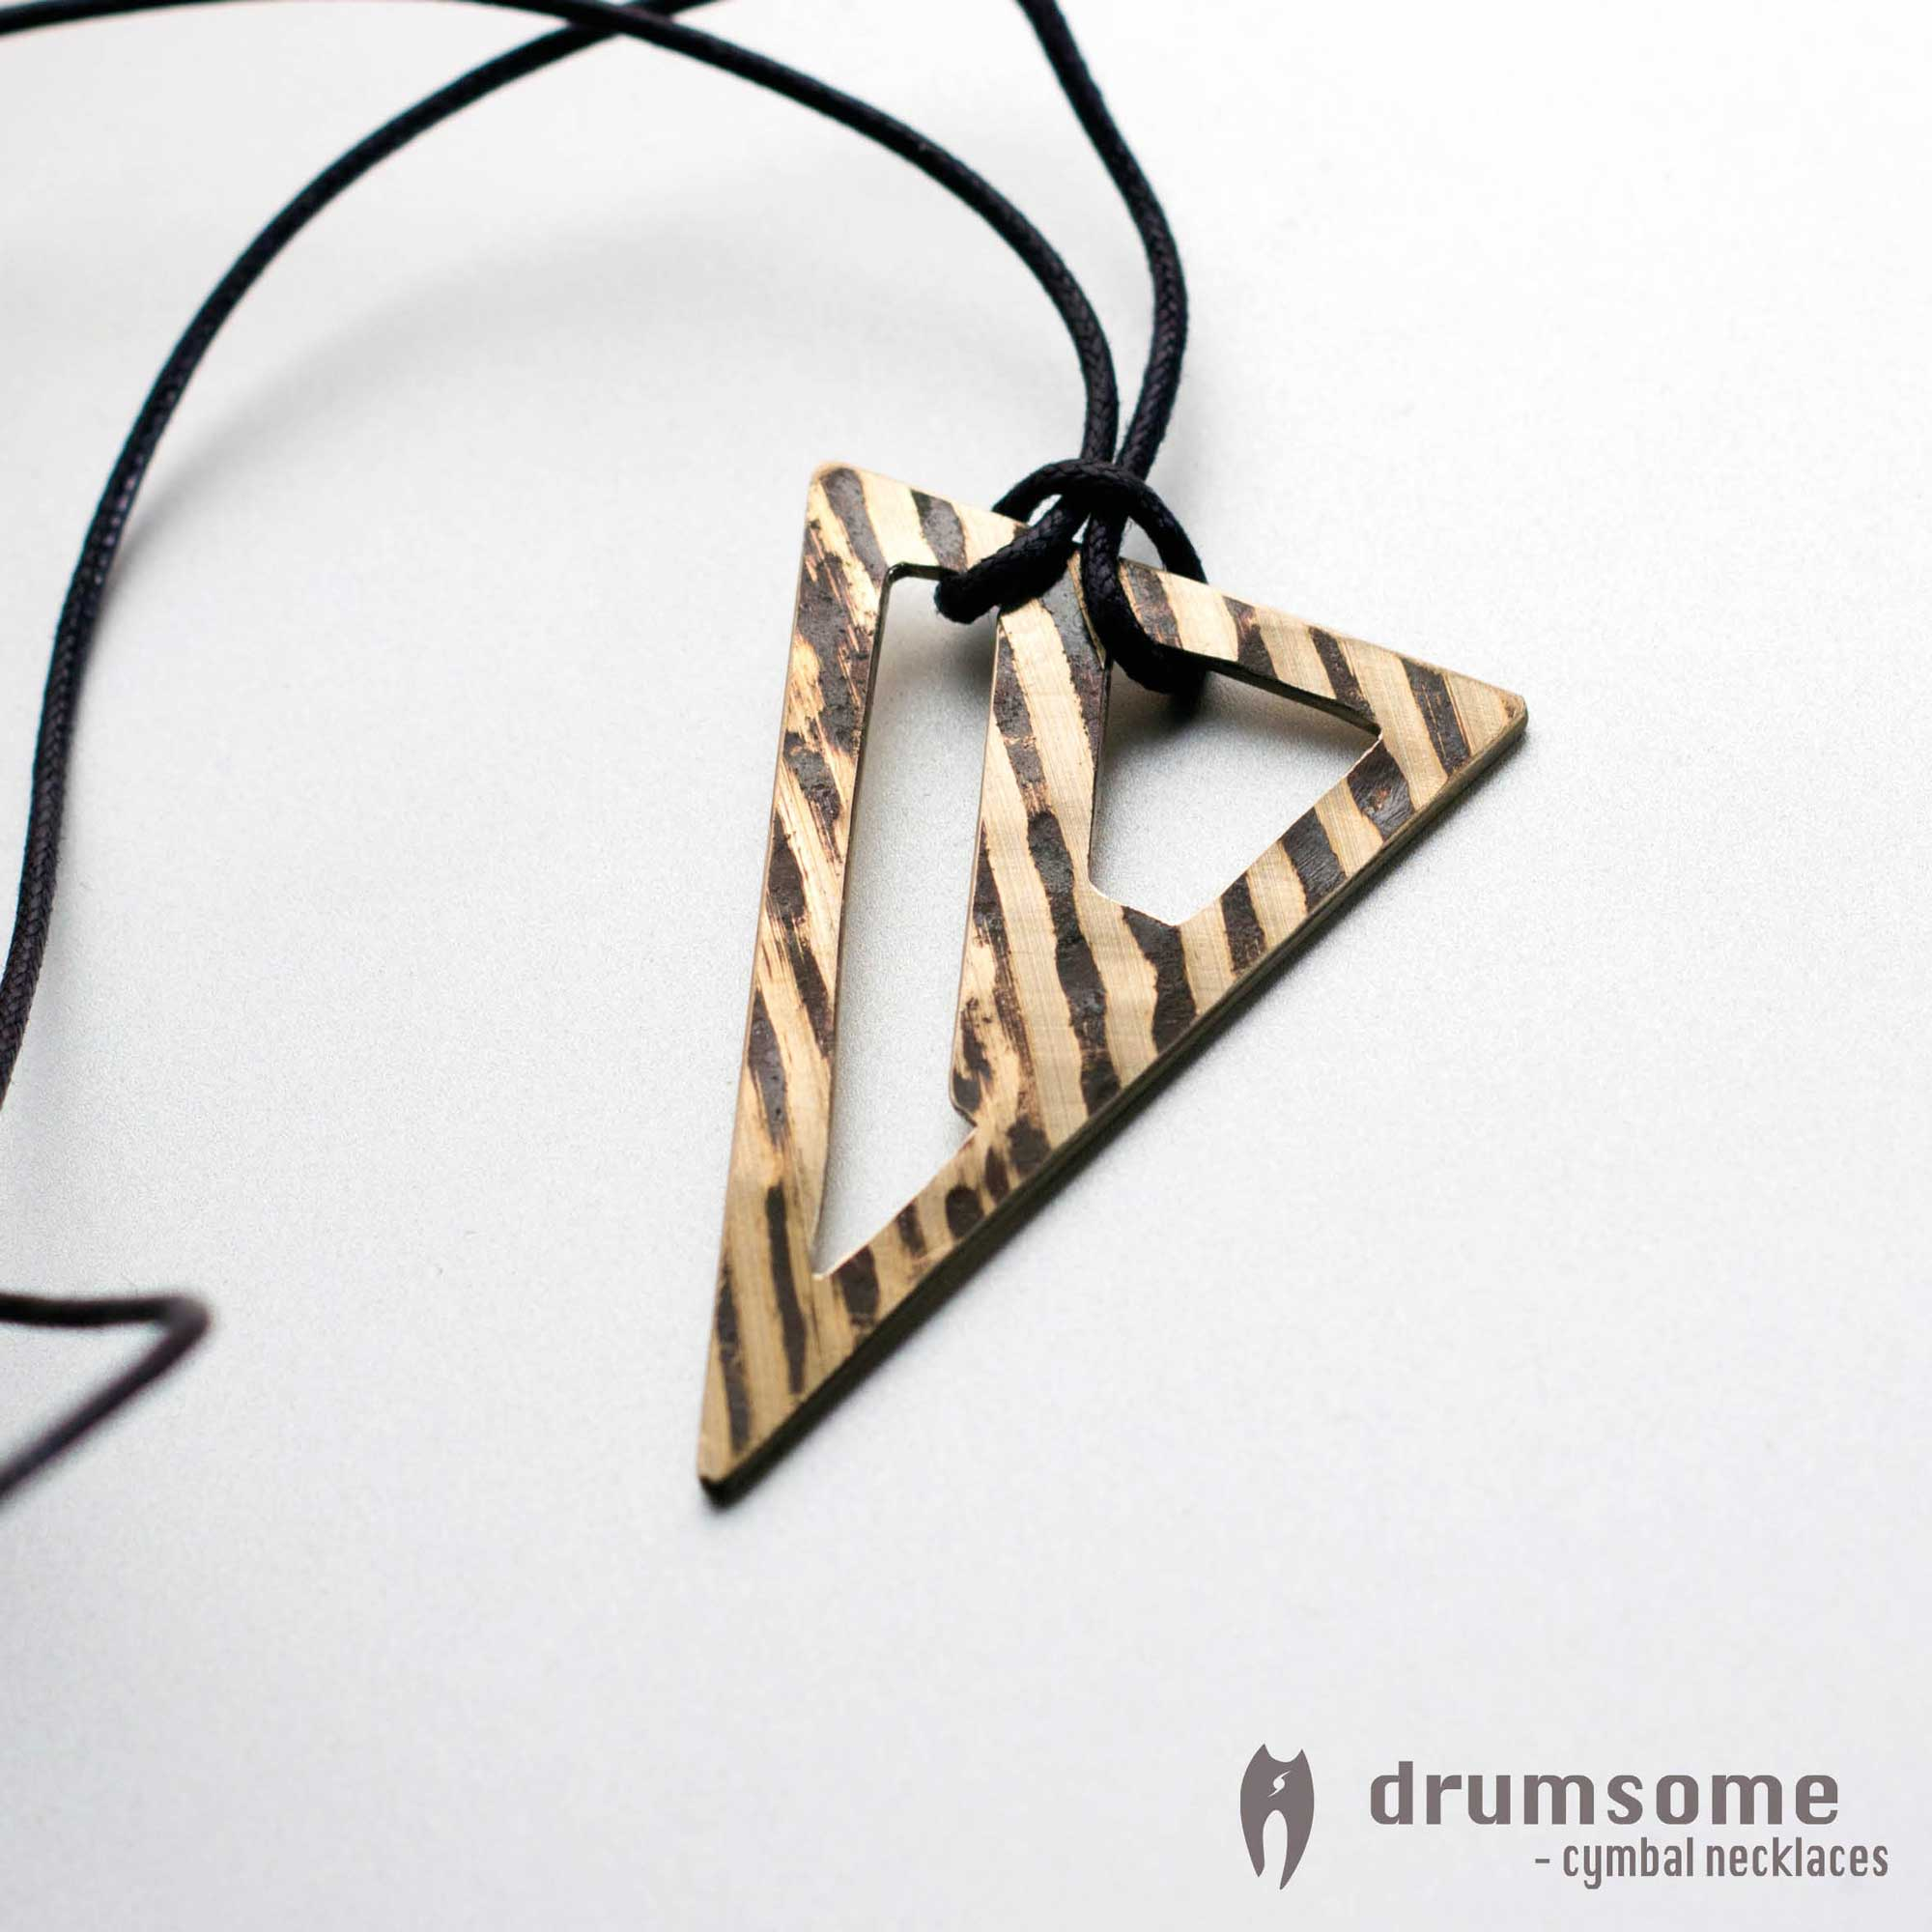 drummer necklace